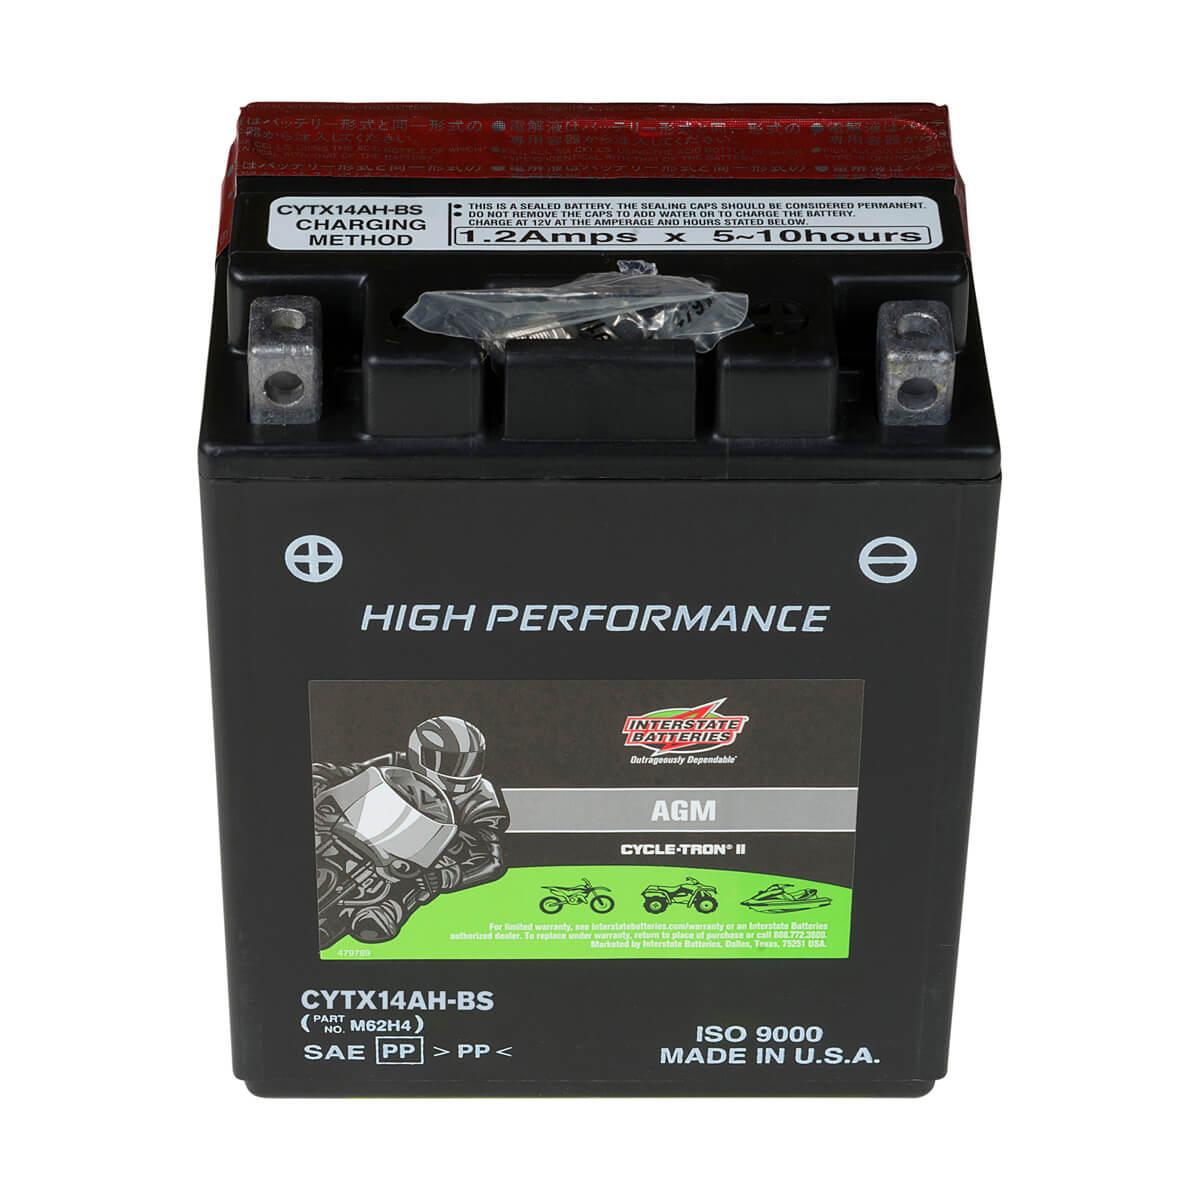 Cycletron AGM 12 Volt Battery, Non Spillable - CYTX14AH-BS